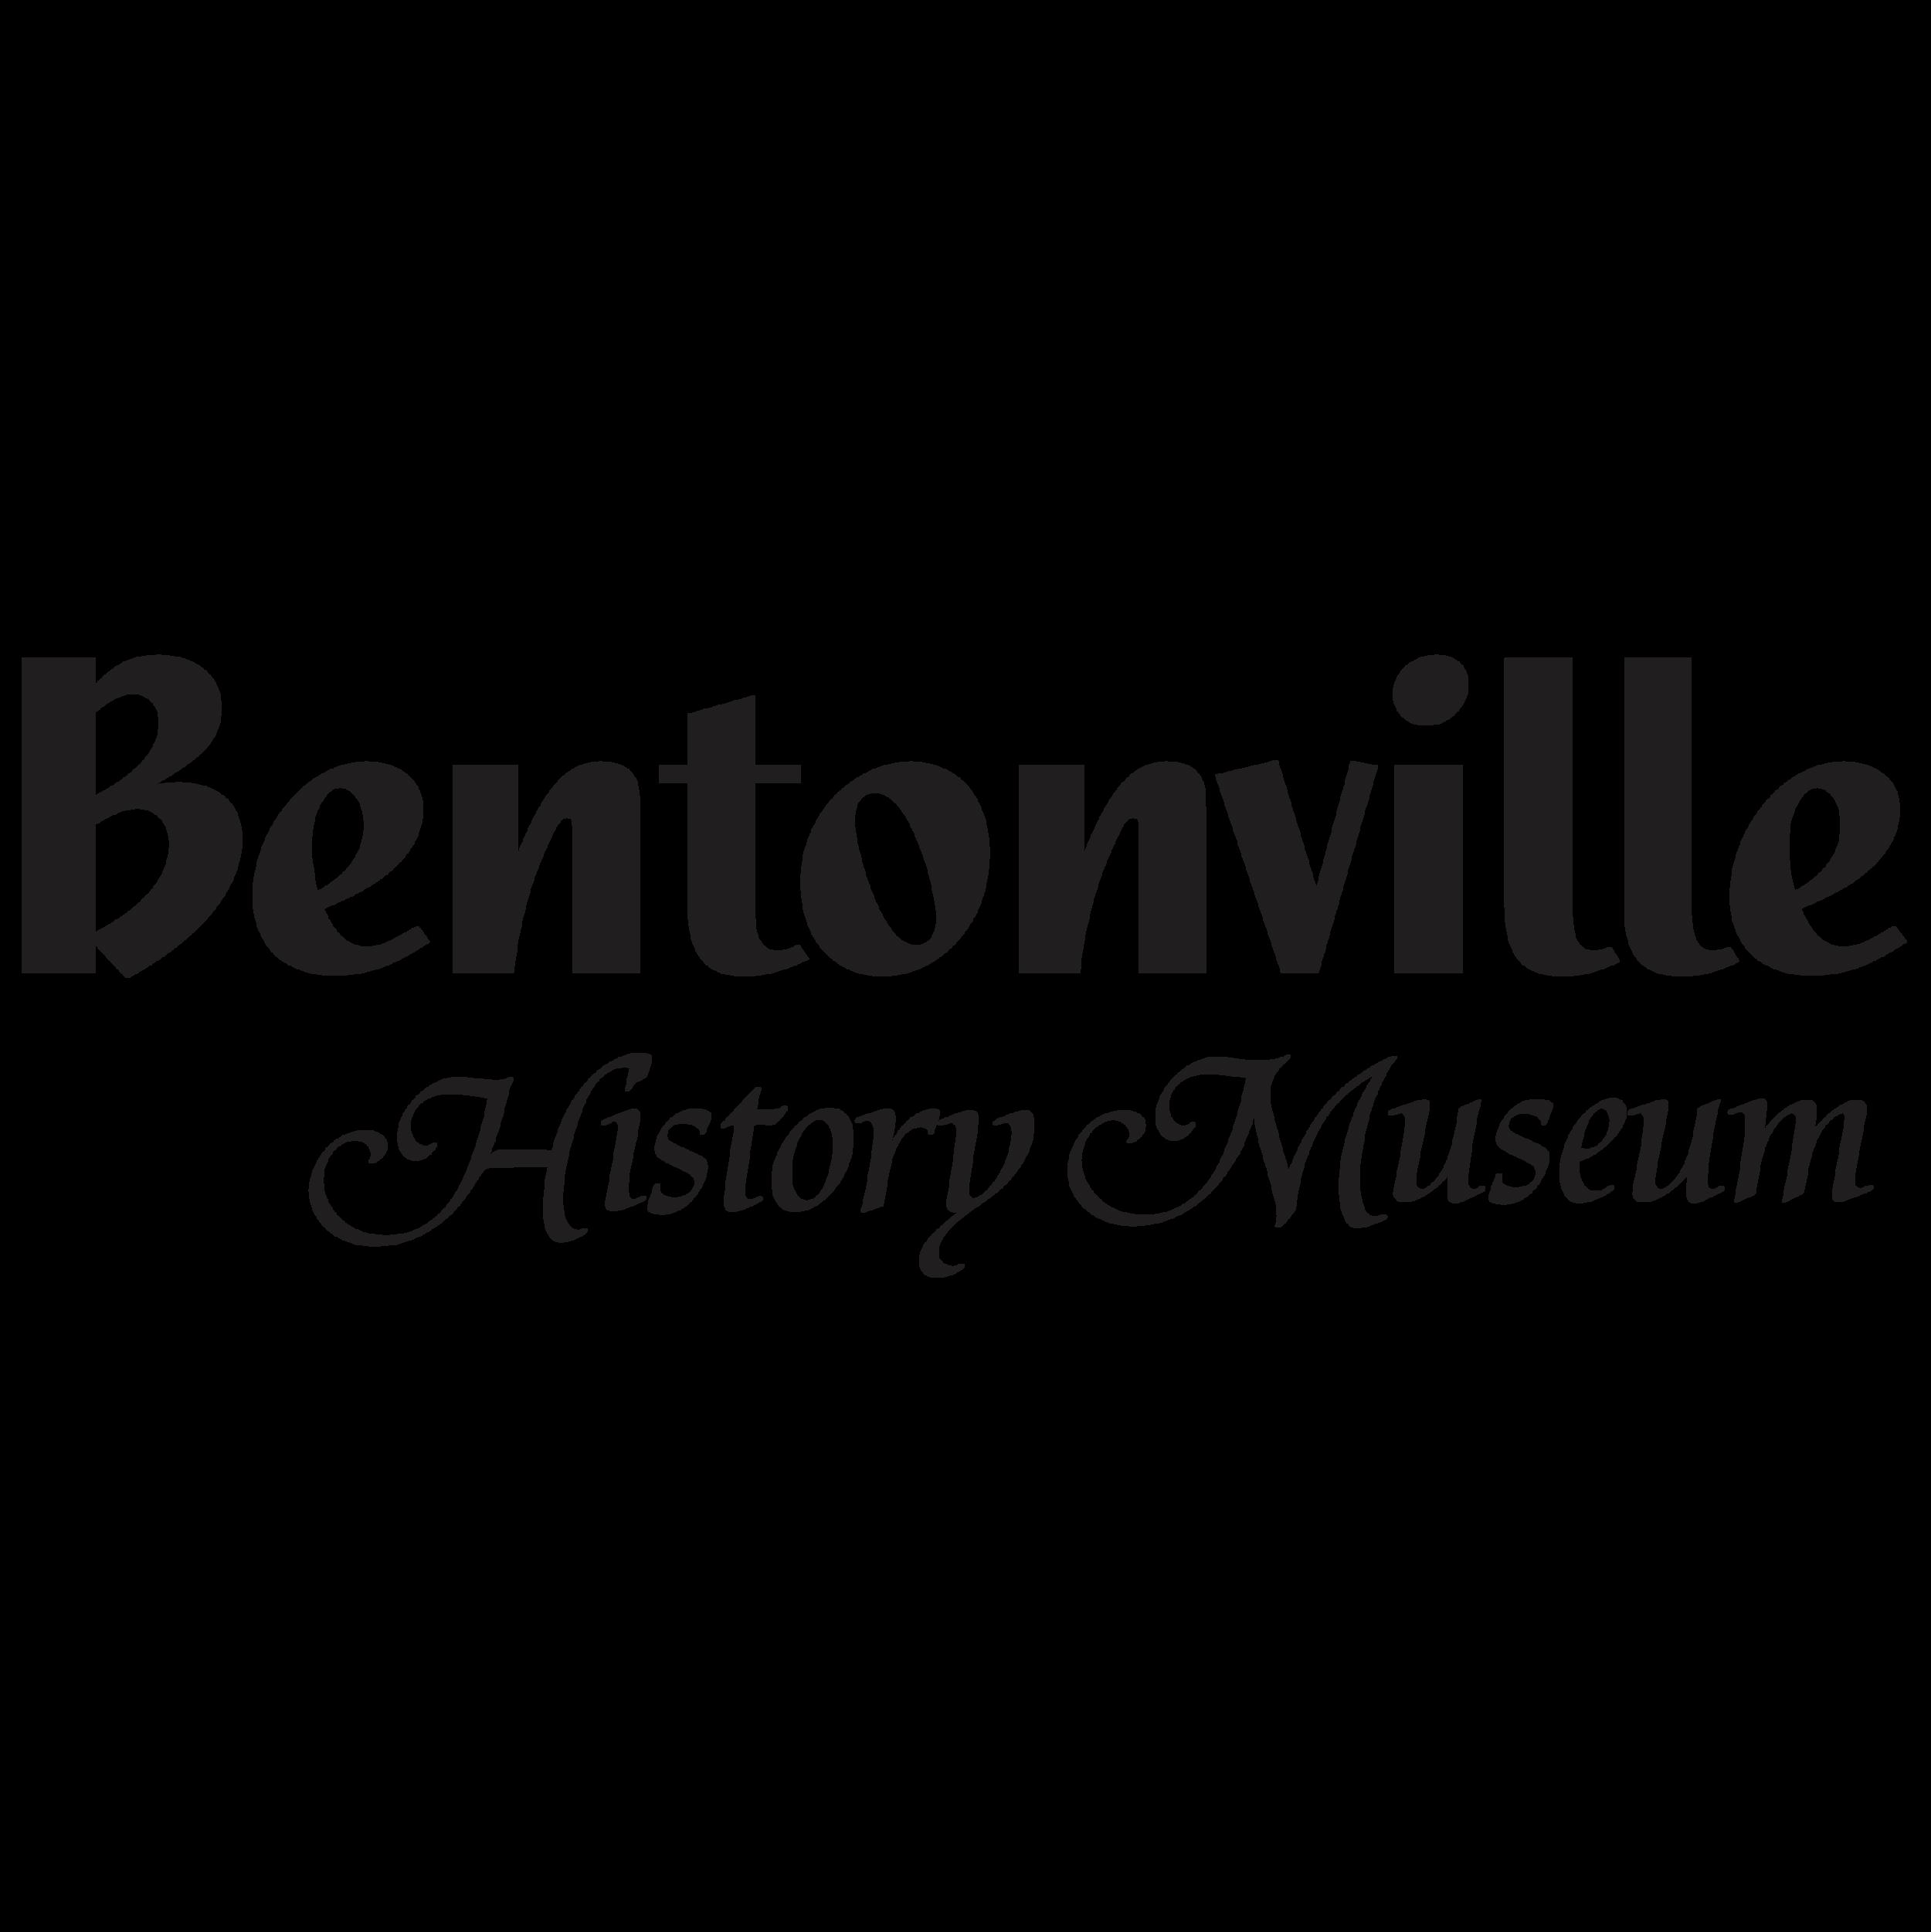 Bentonville History Museum